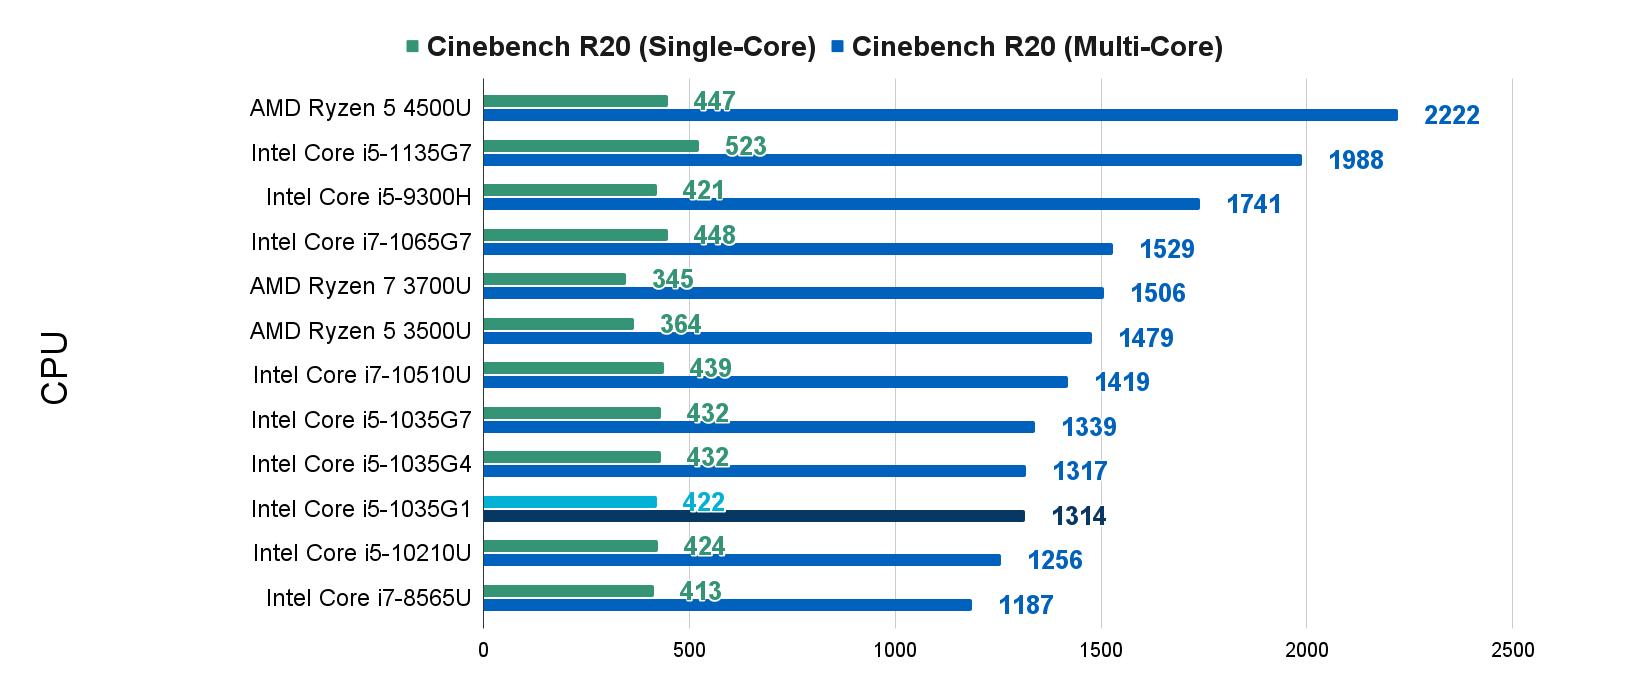 R20 Benchmarks